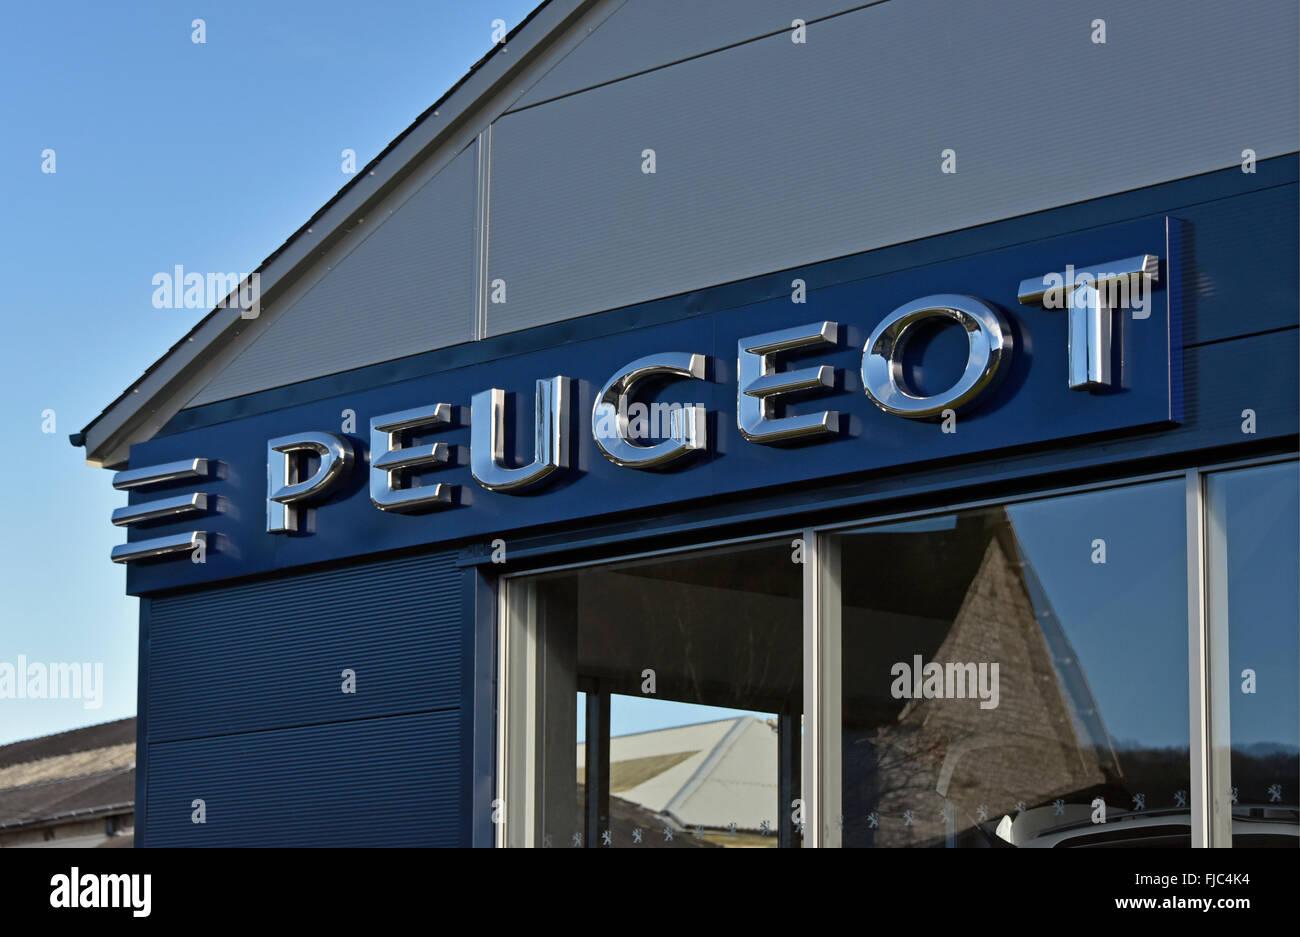 peugeot-car-dealership-FJC4K4.jpg